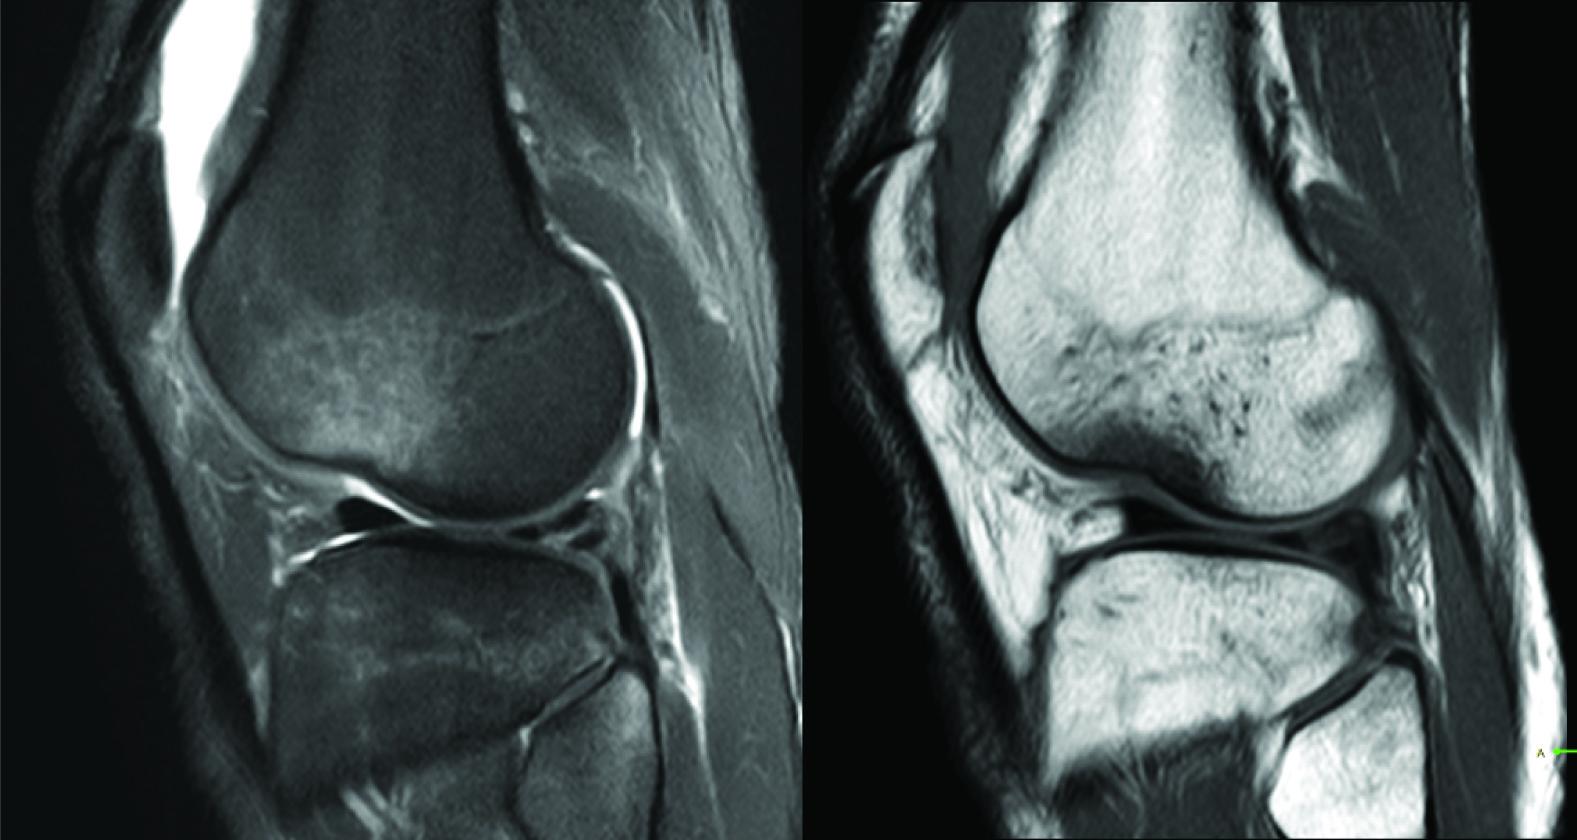 JCDR - Bone contusions, Bone marrow edema, MRI of fractures ...